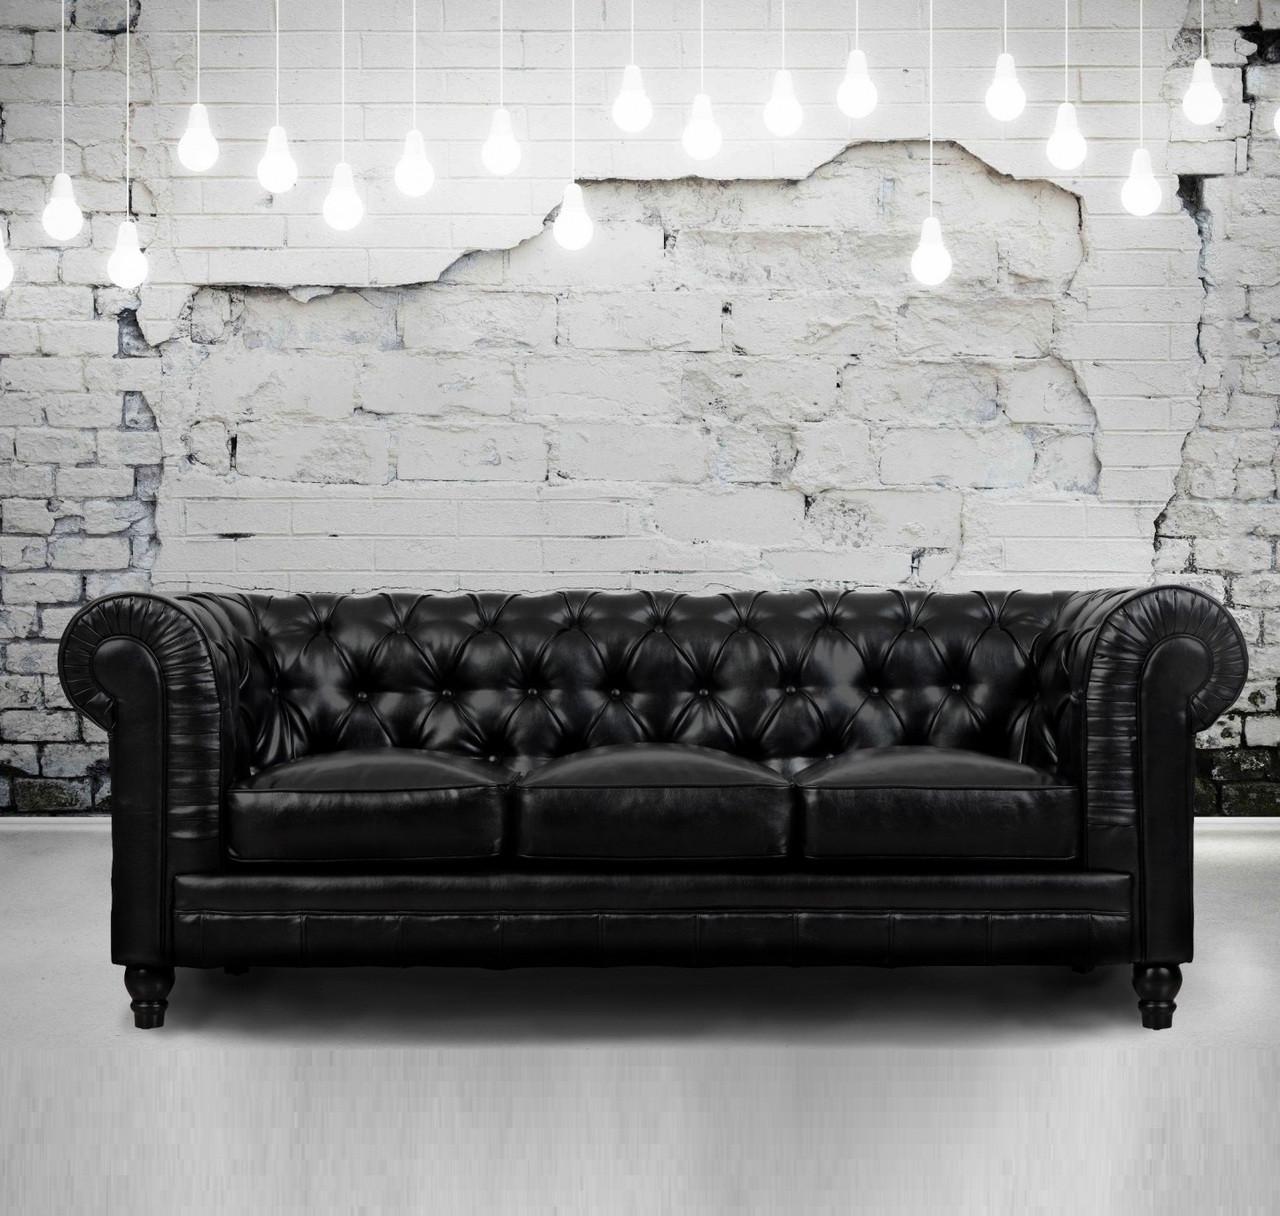 Zahara Tufted Black Leather Chesterfield Sofa